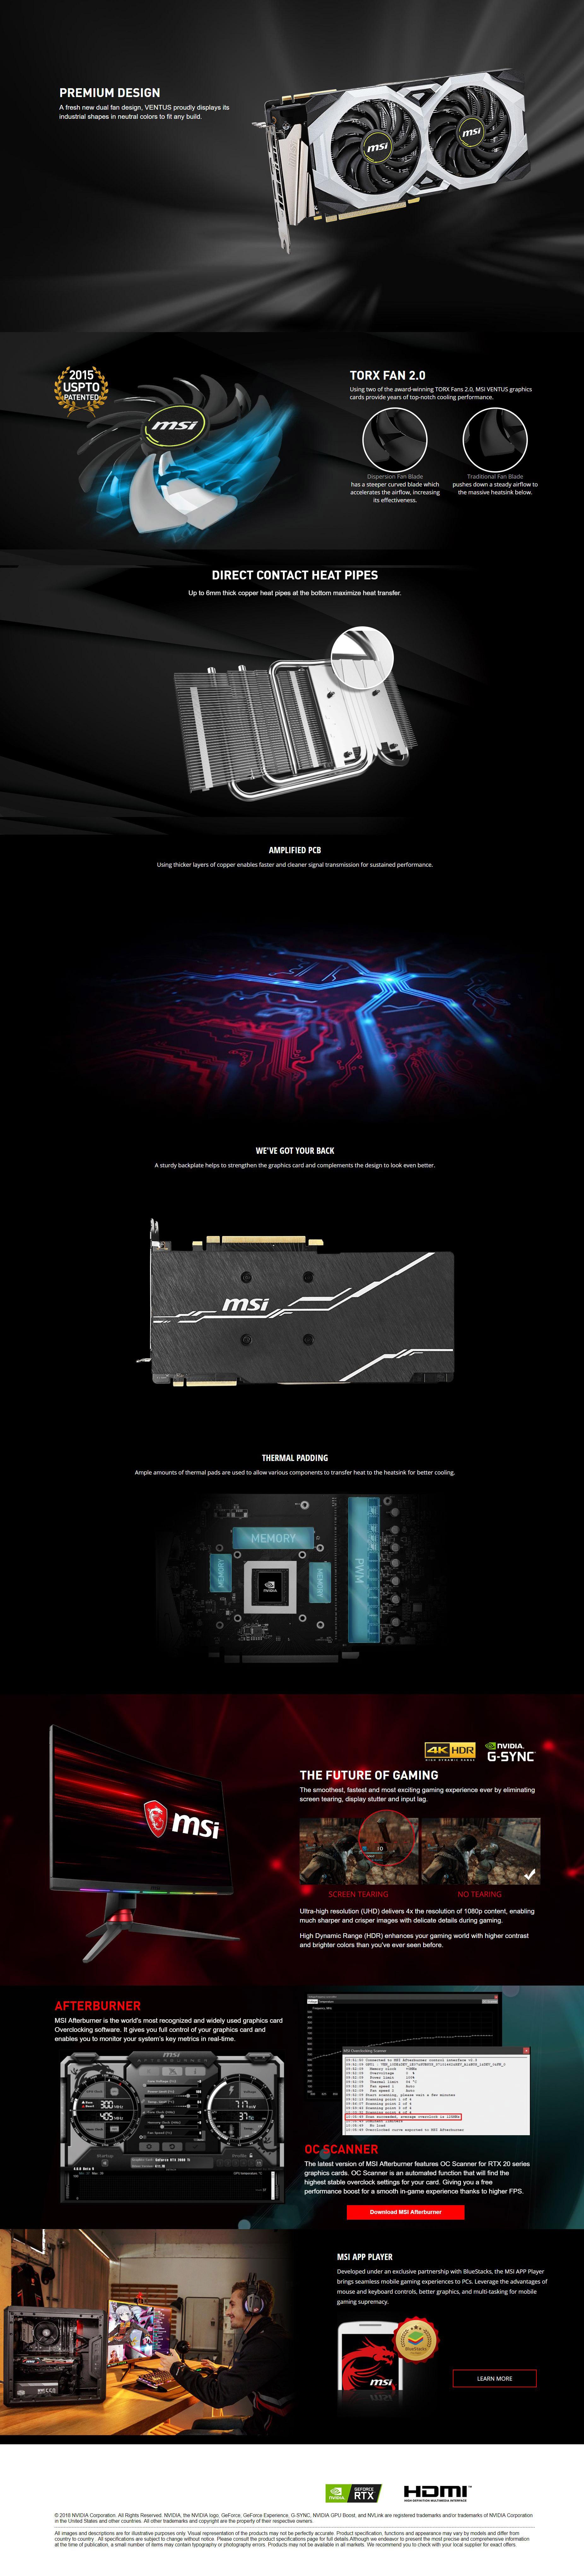 MSI Geforce RTX 2070 SUPER VENTUS OC Graphics Card